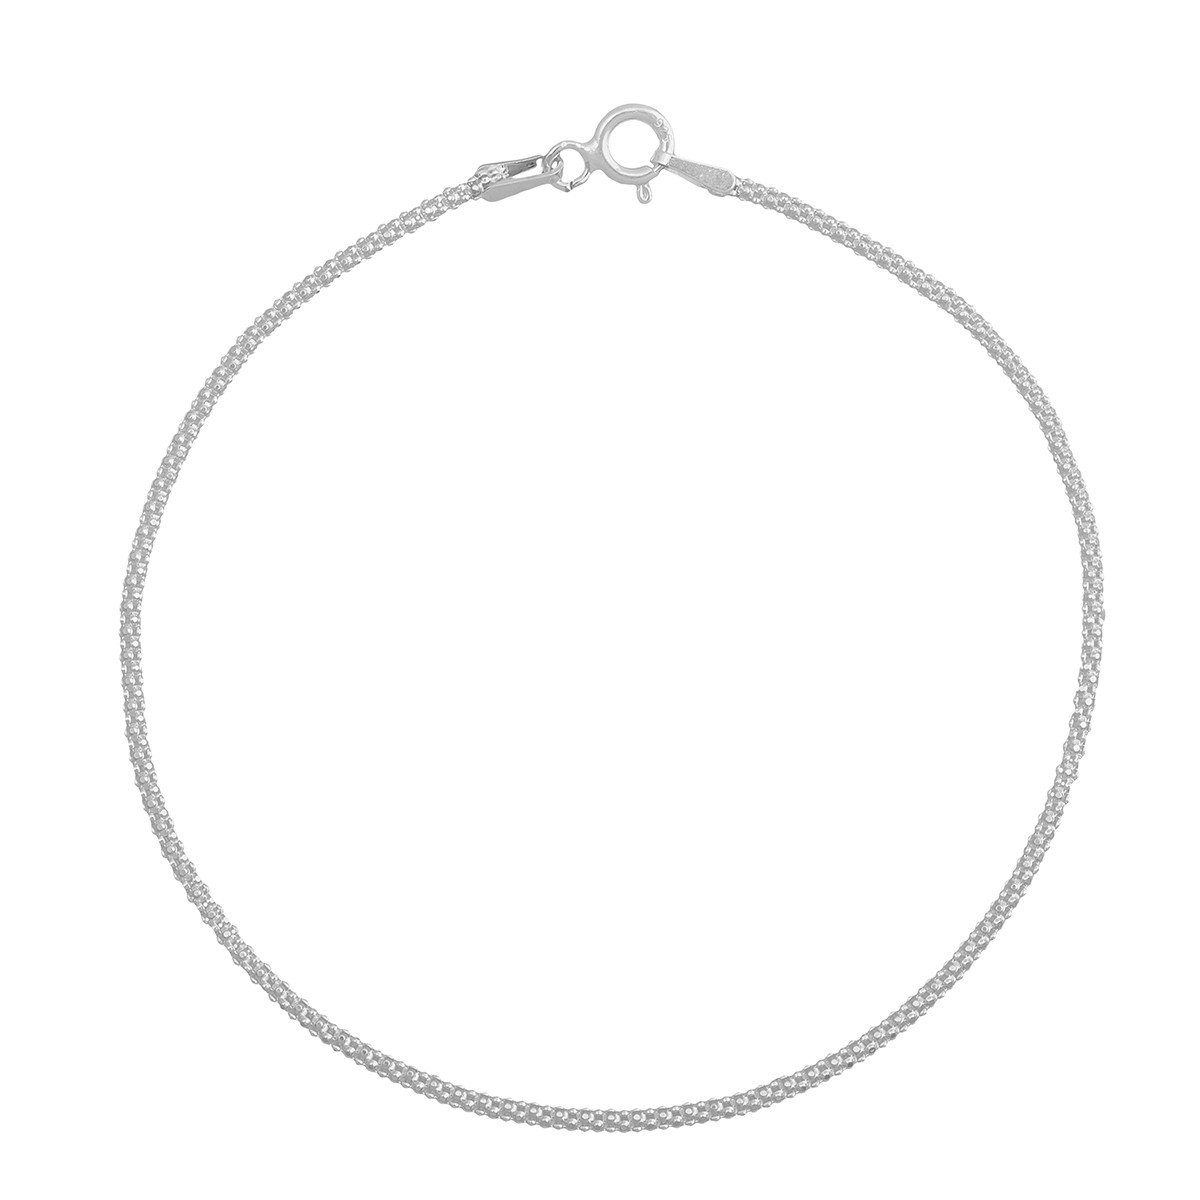 Pulseira Feminina 18cm Pipoca De Prata 925 Maciça